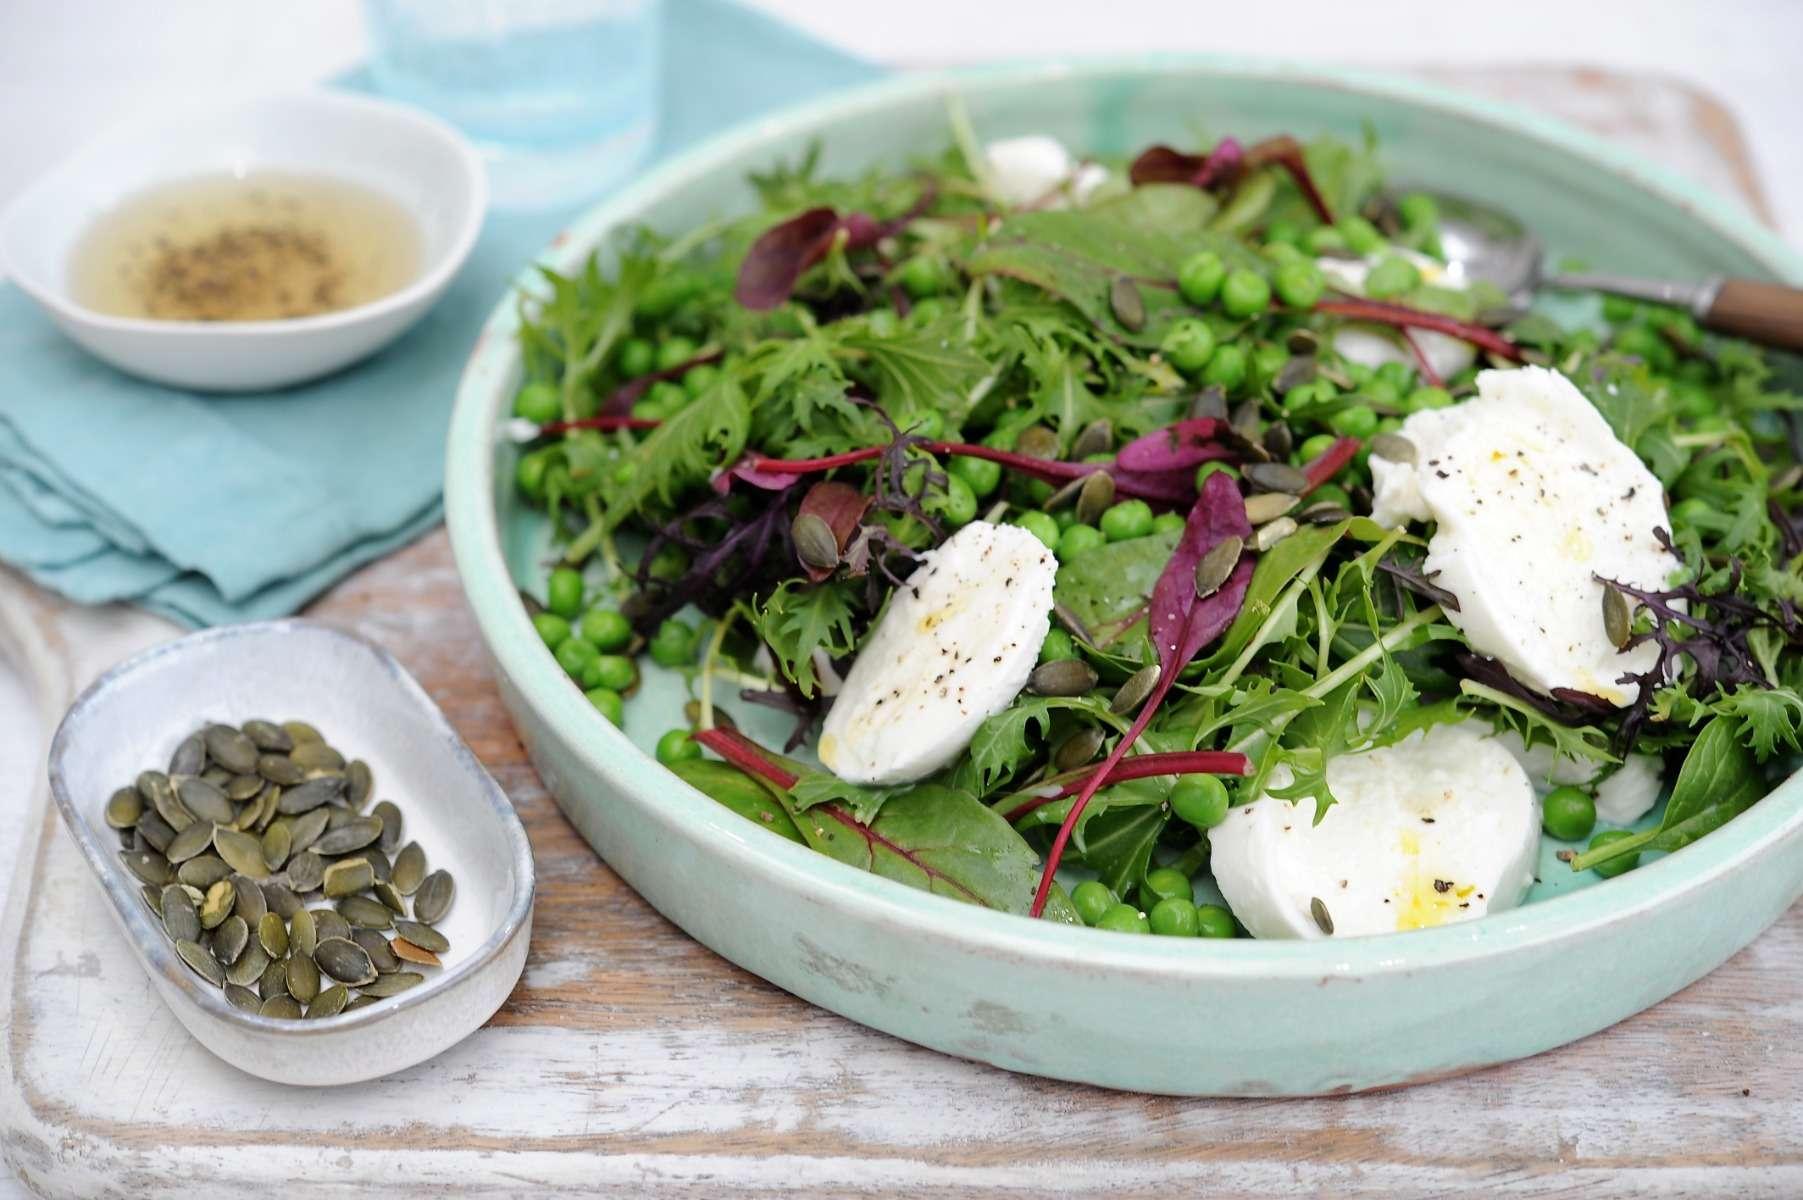 Green Salad with Mozzarella